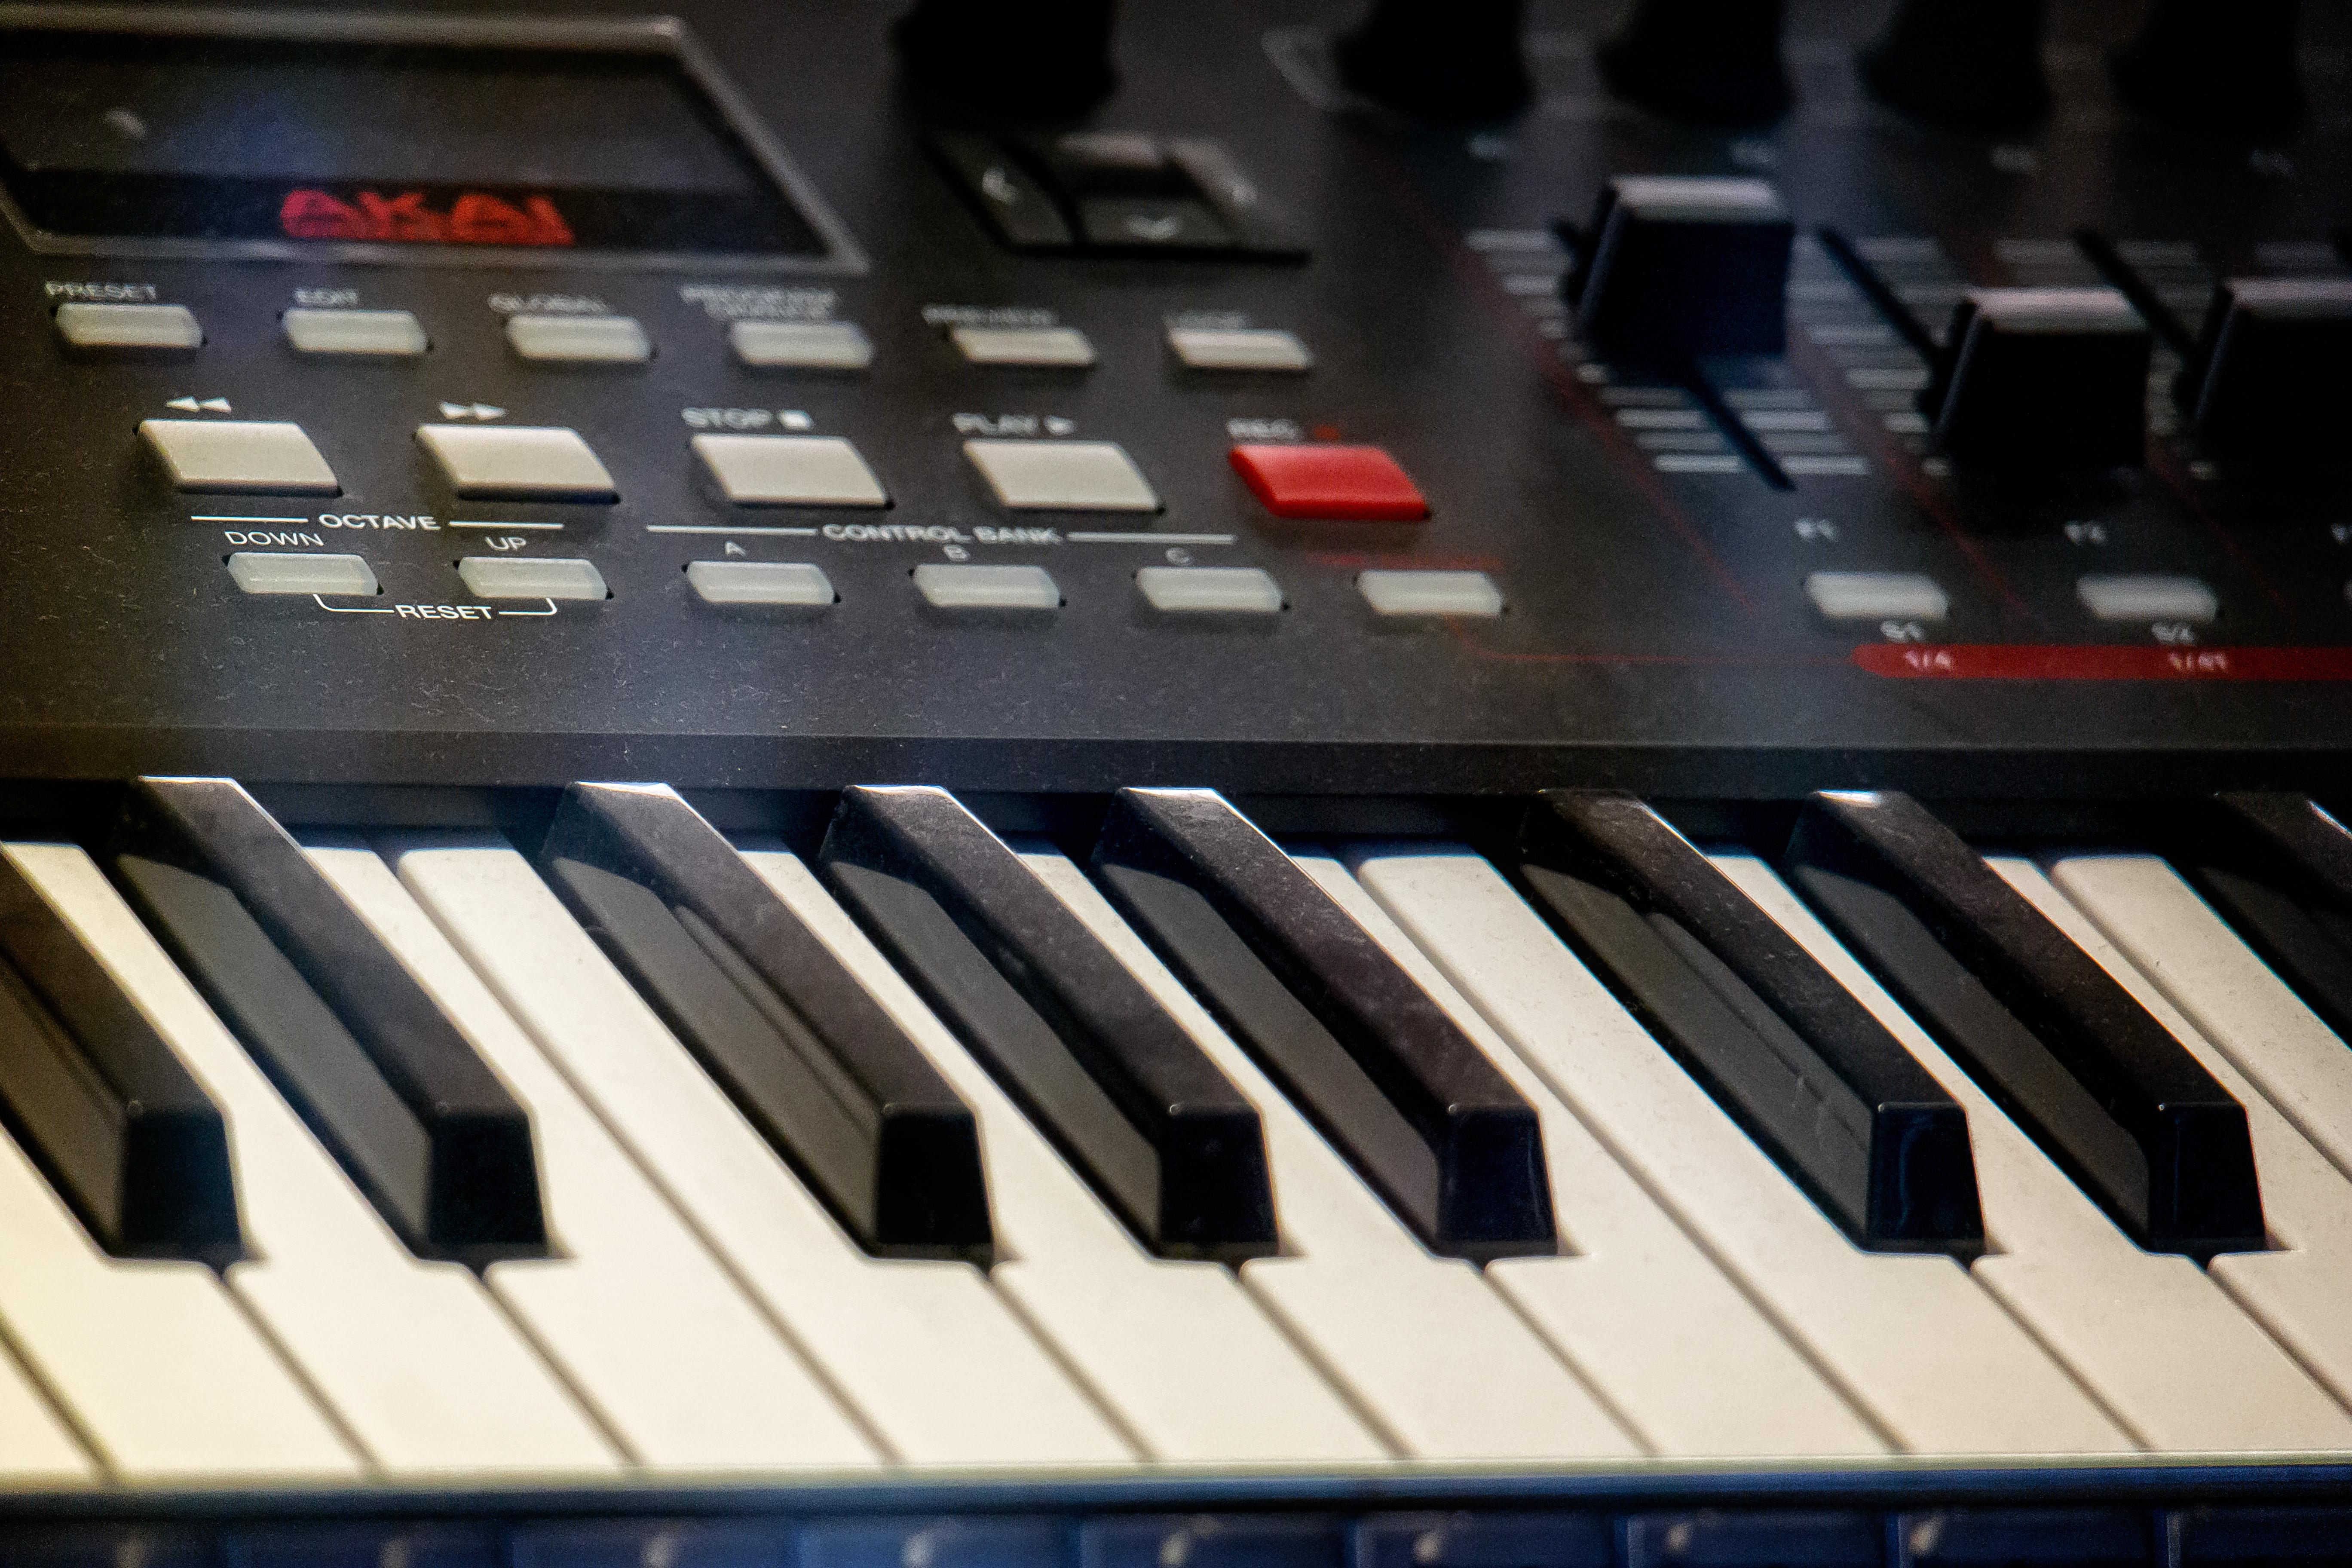 File:AKAI MPK261 Performance Keyboard Controller - center angled